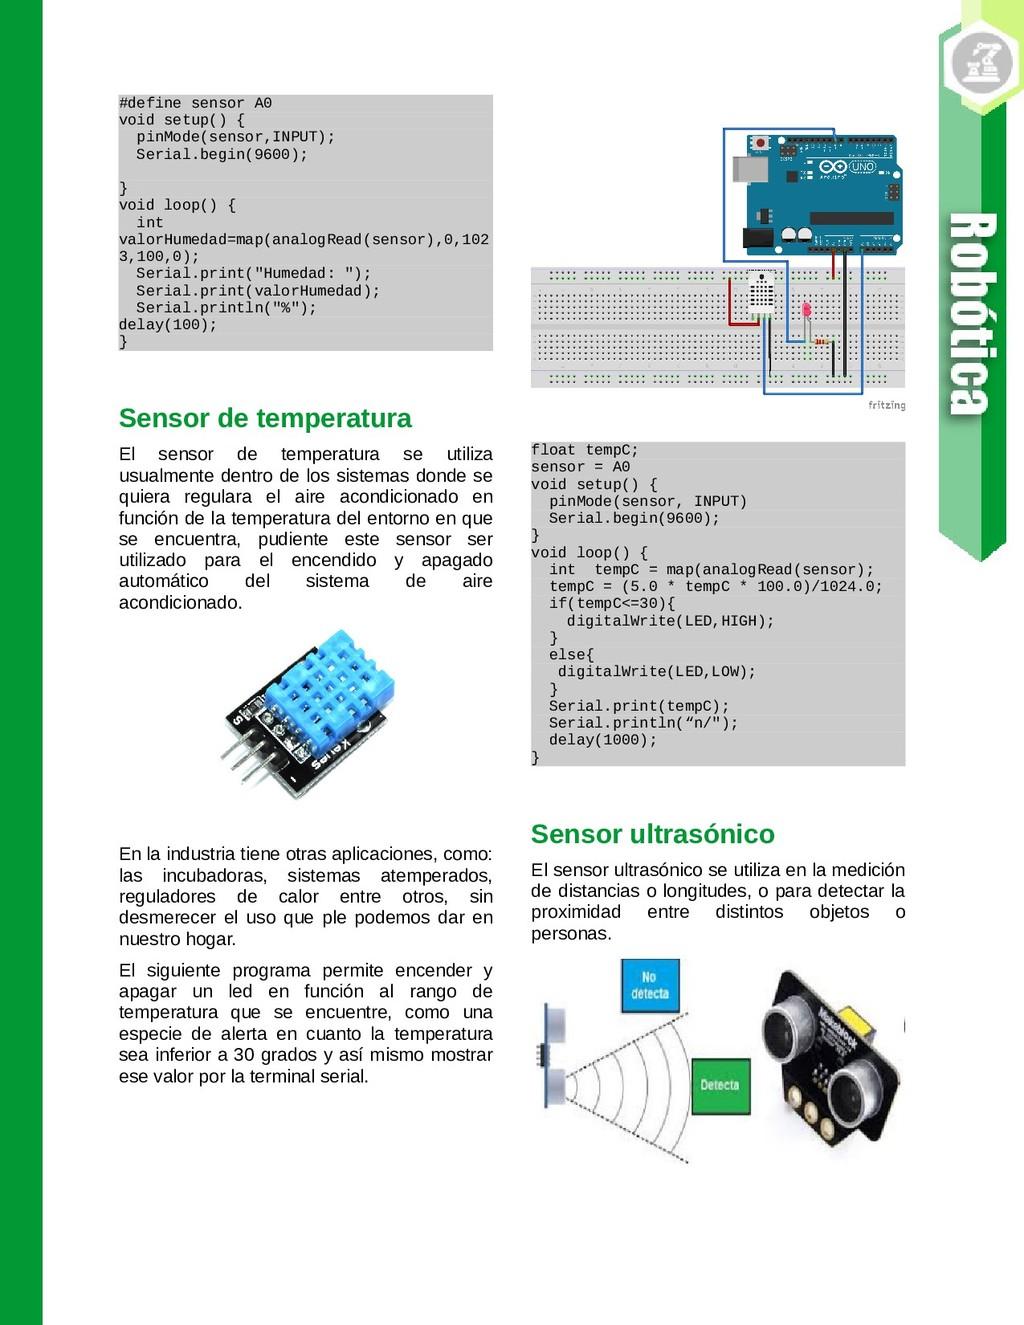 #define sensor A0 void setup() { pinMode(sensor...